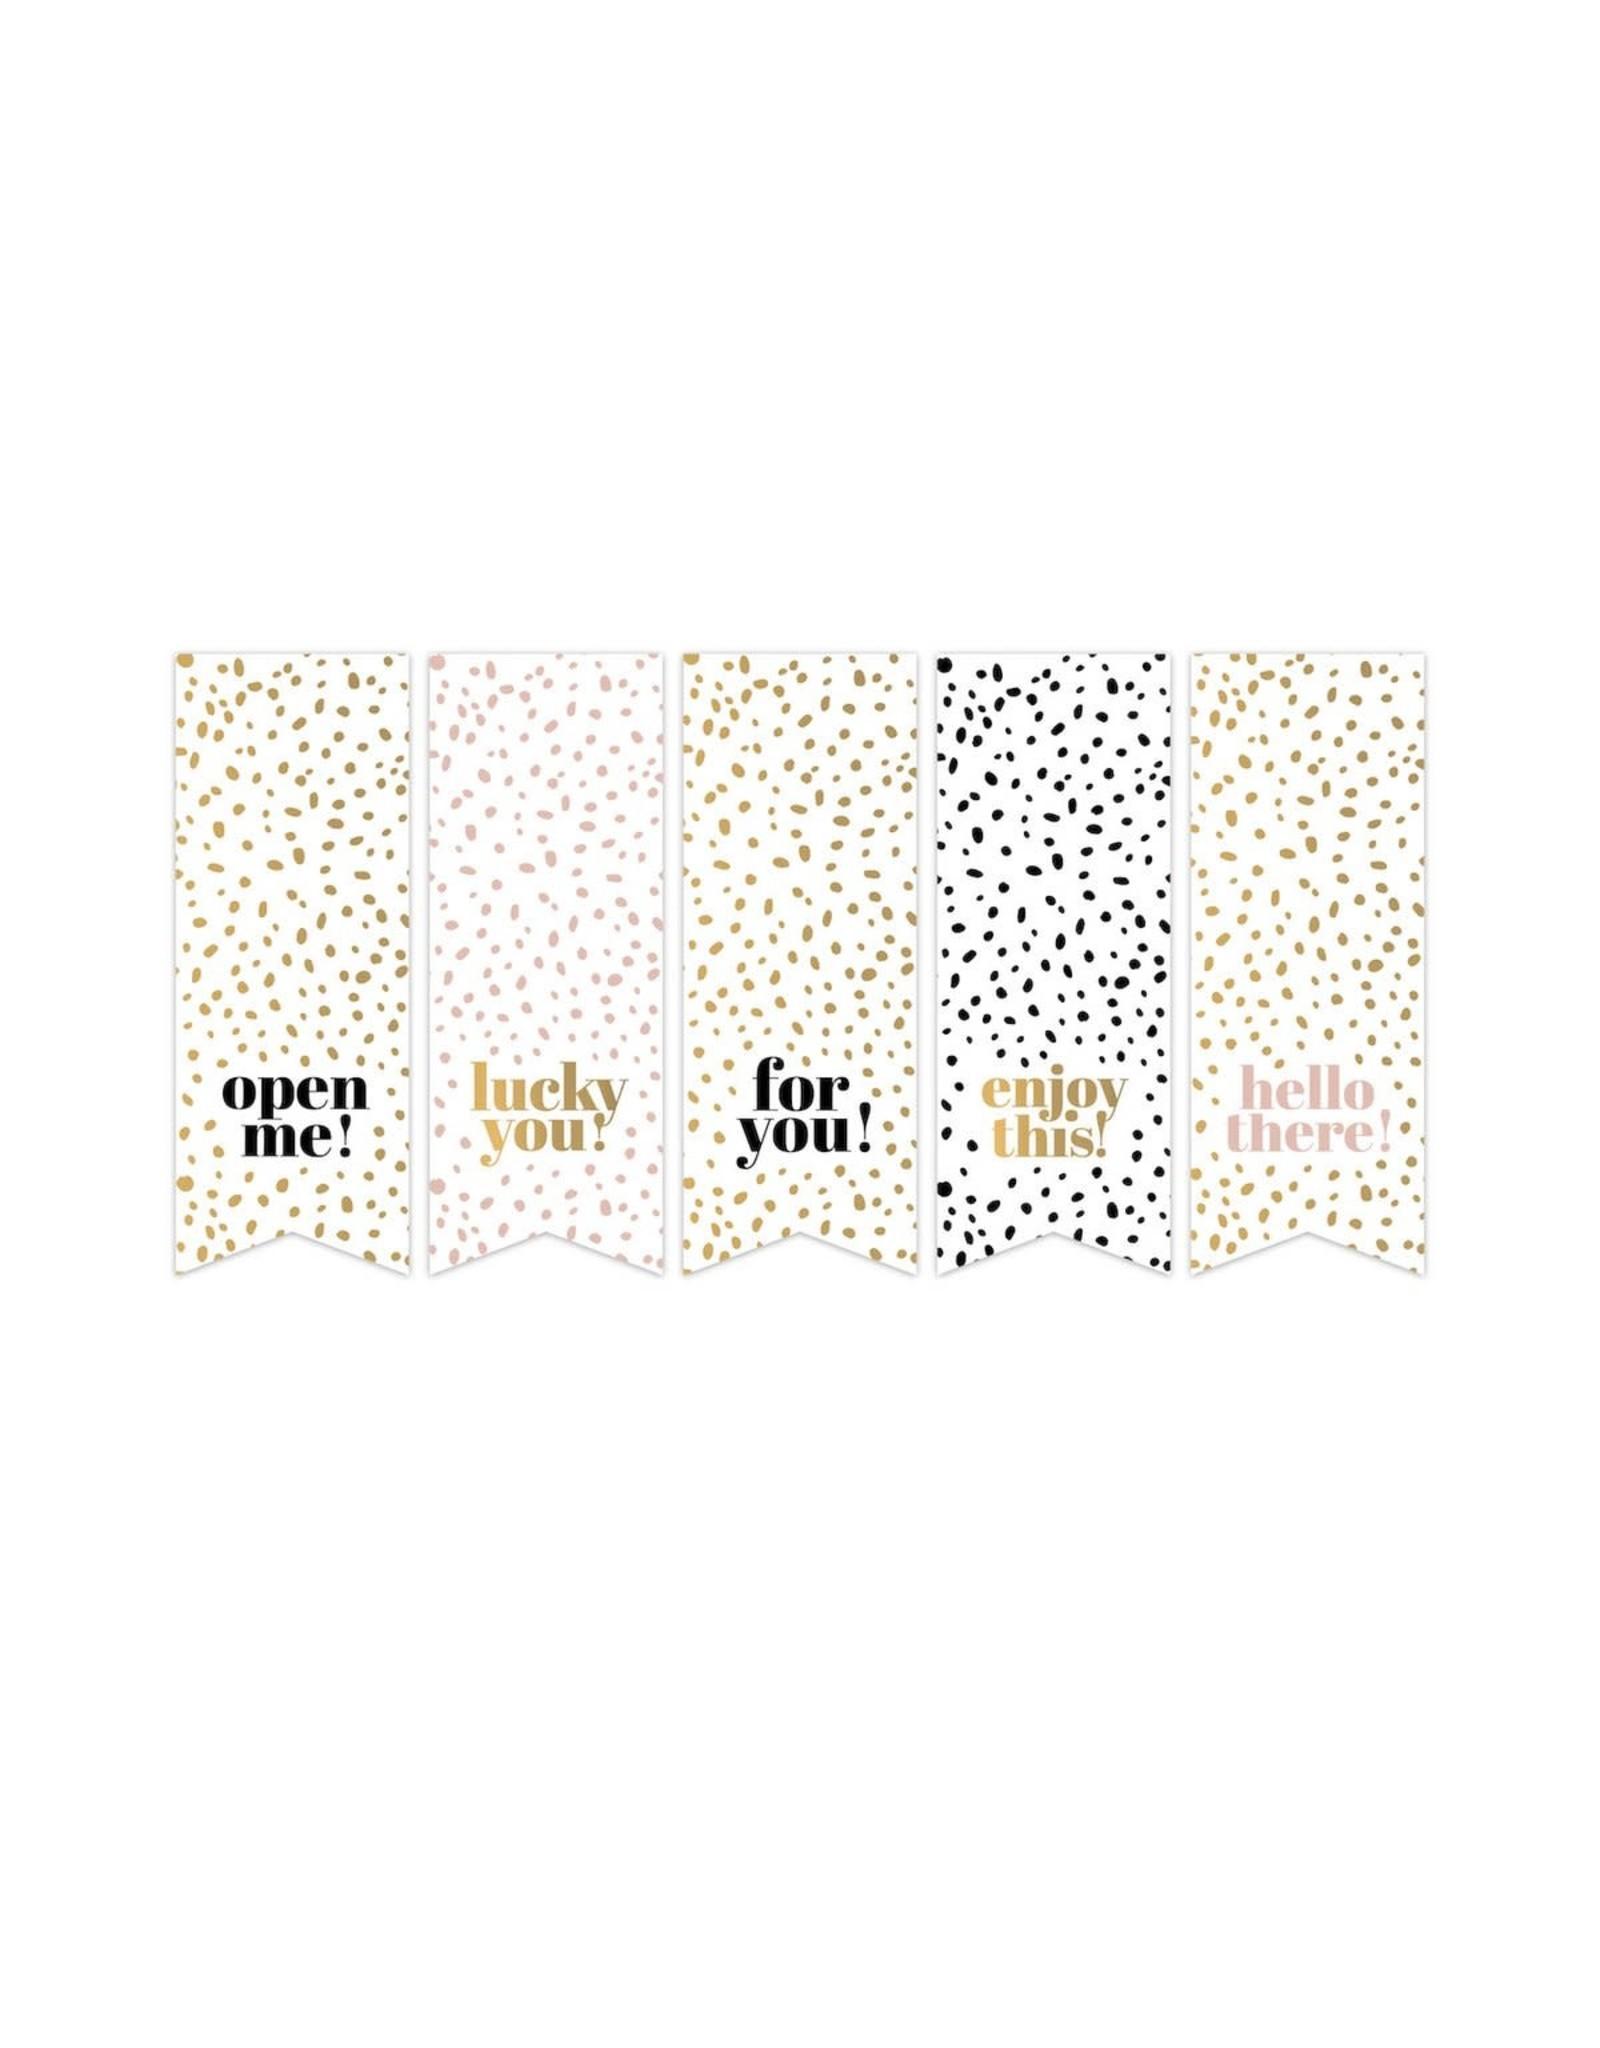 Stickers 5st. vlaggetjes stippen goudfolie